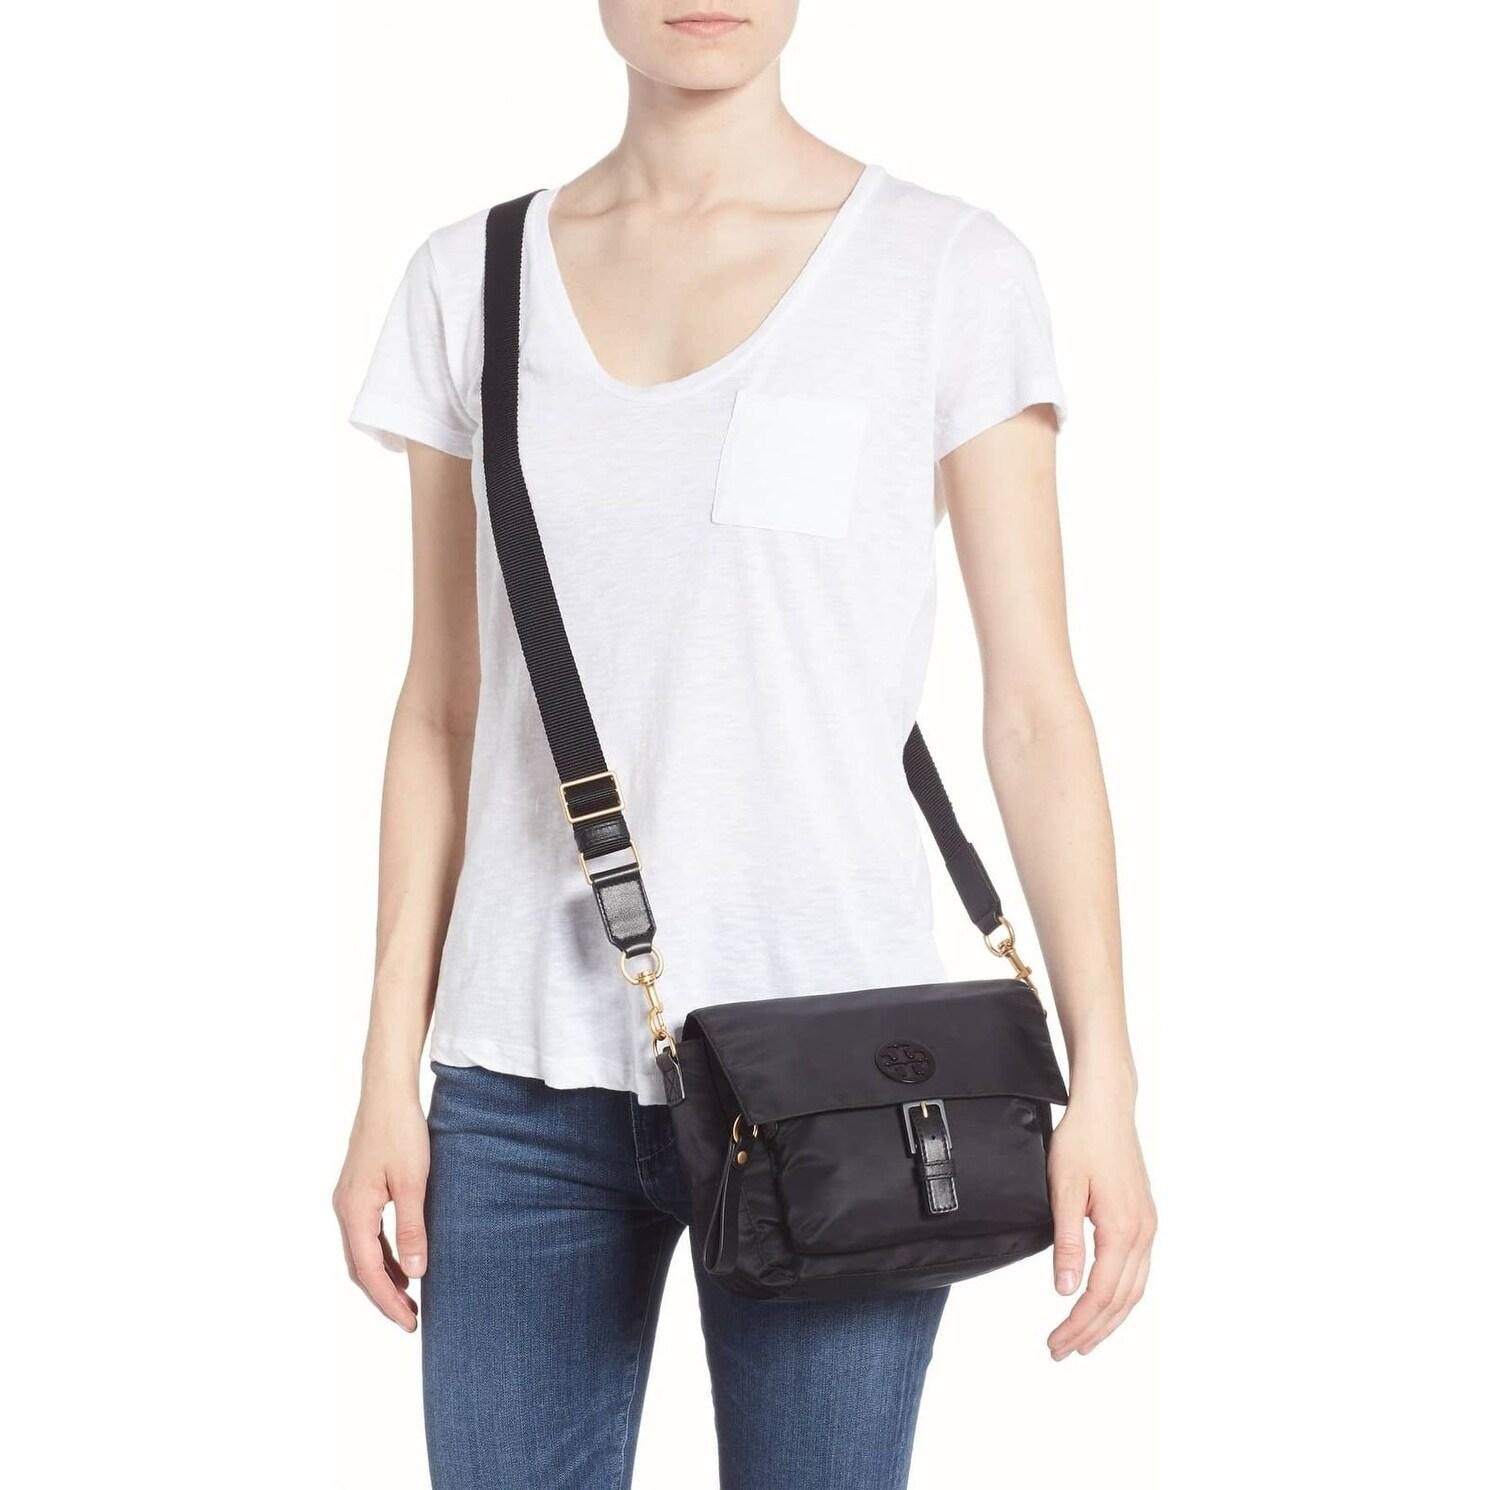 4f204c2b2f7 Shop Tory Burch Tilda Nylon Crossbody Bag Black - Free Shipping Today -  Overstock - 23449864